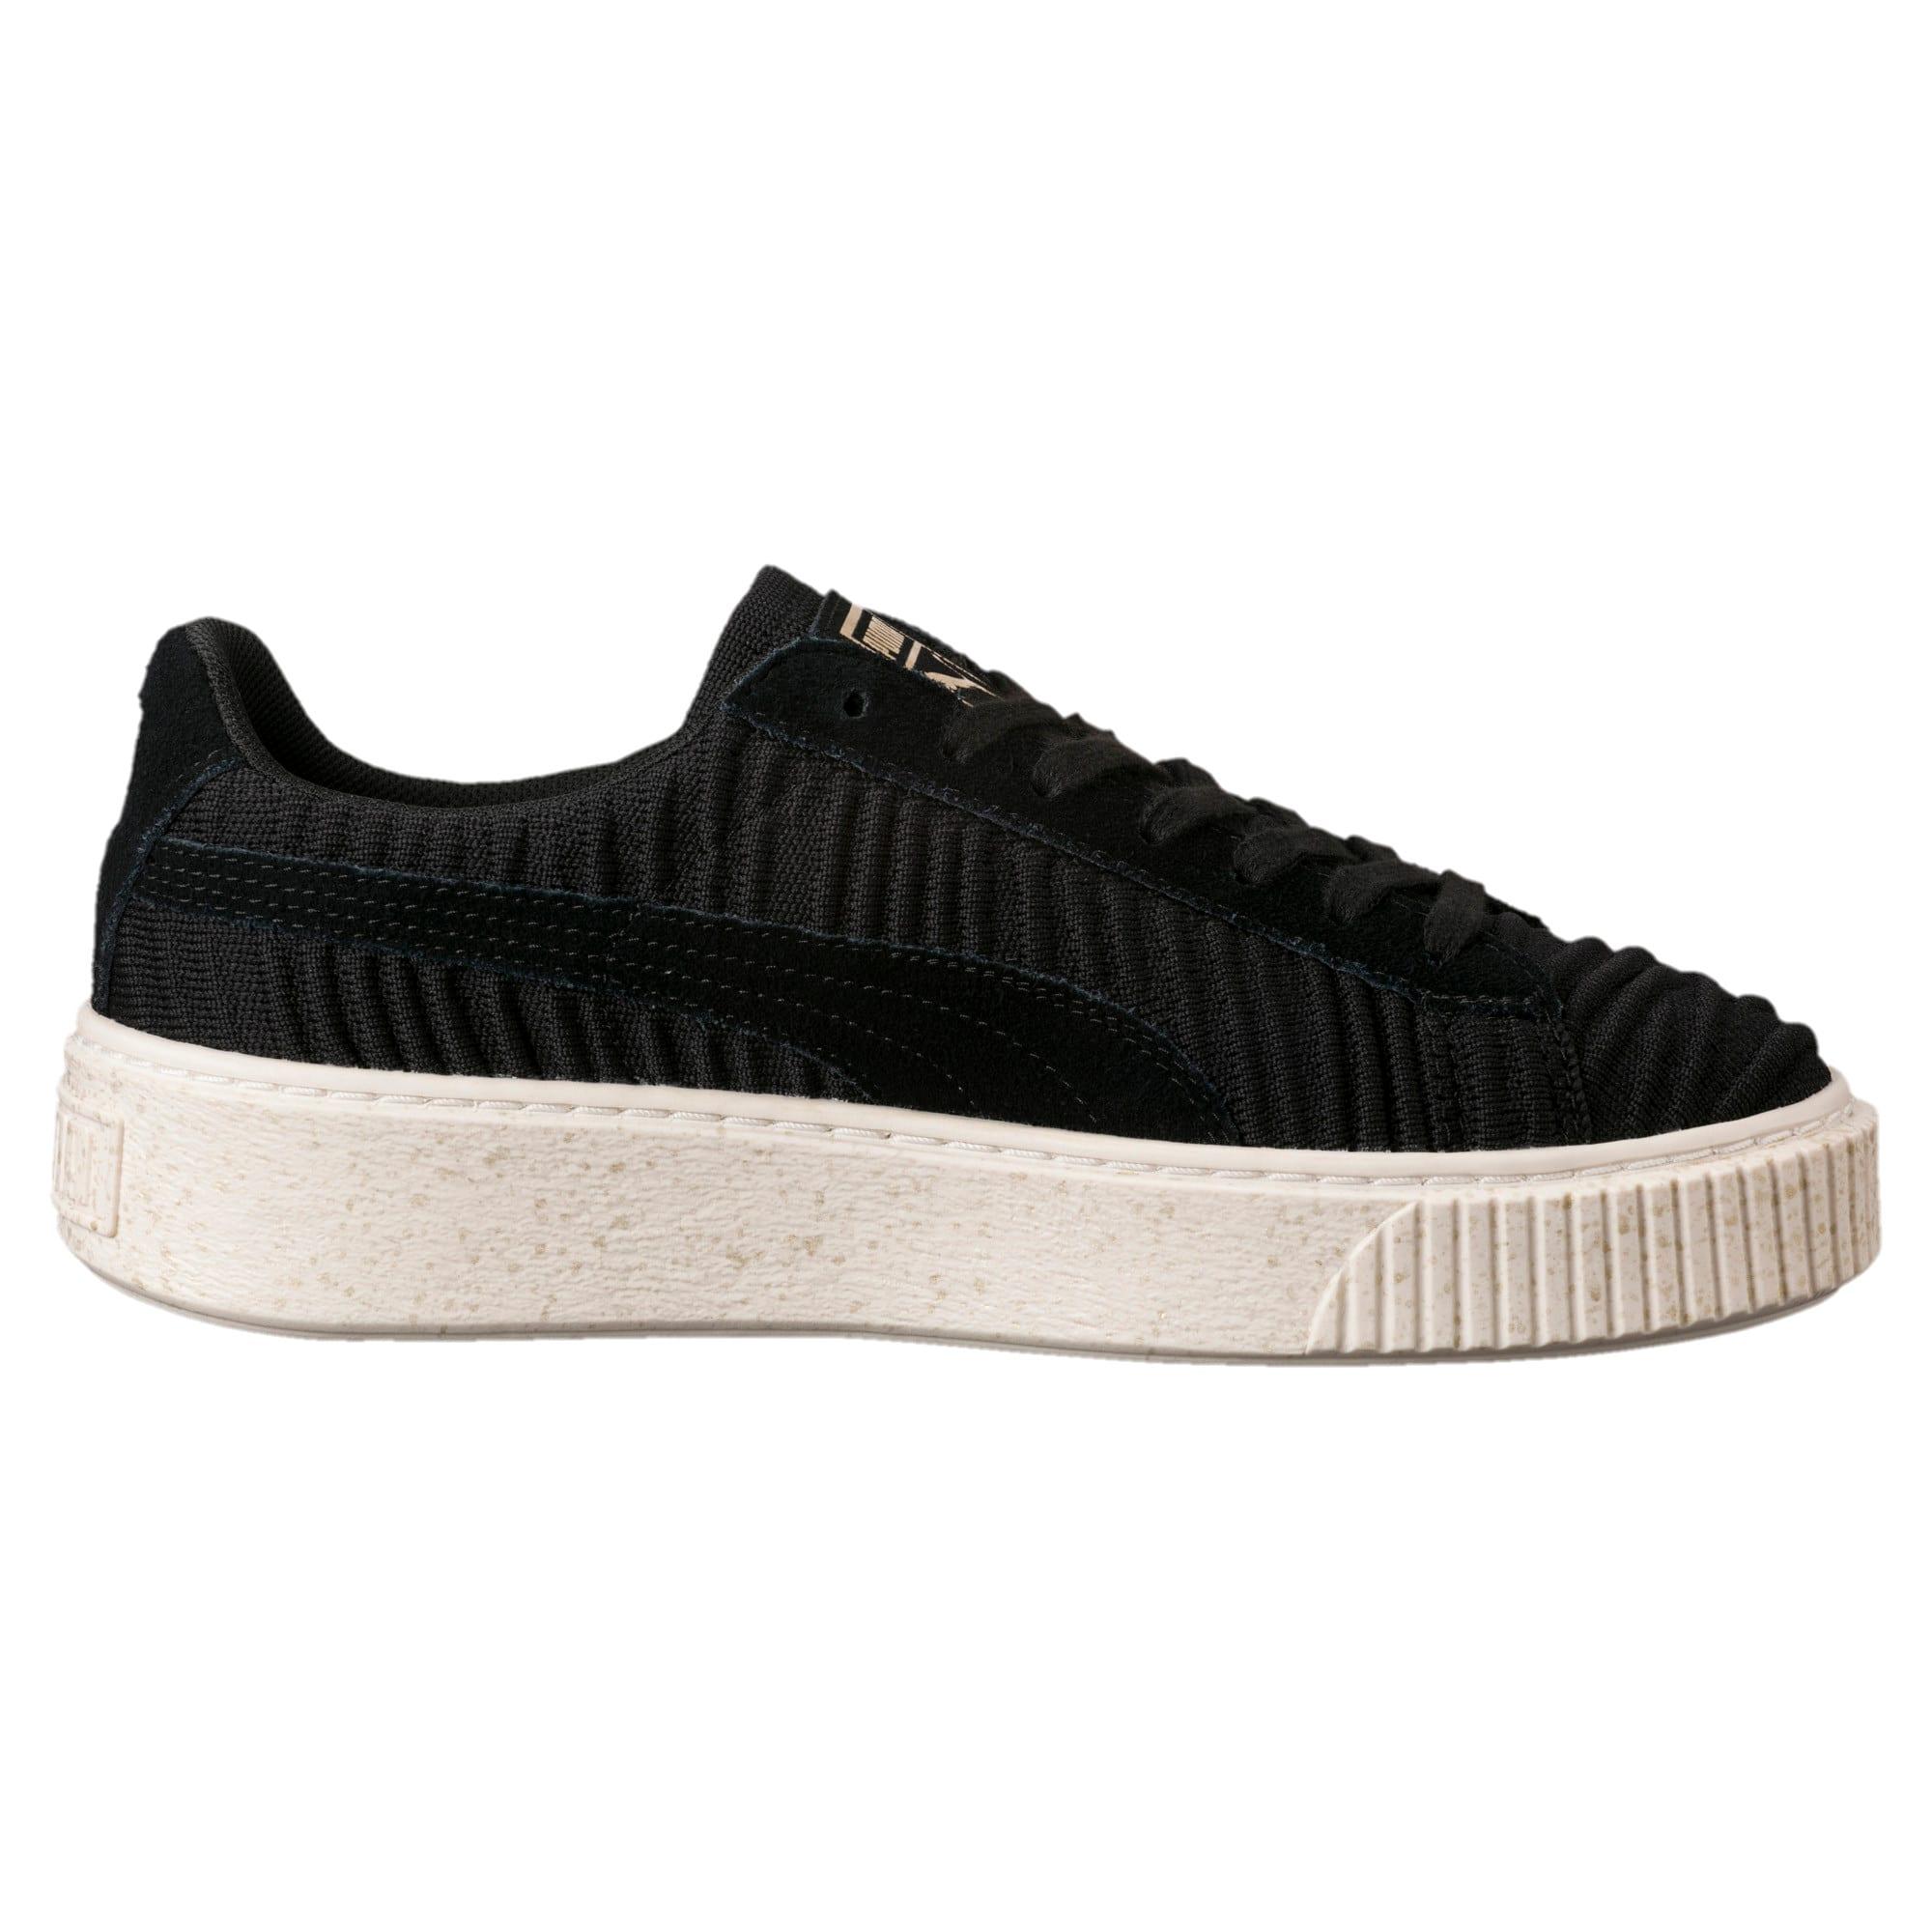 Thumbnail 3 of Basket Platform Women's Sneakers, PBlack-PBlack-Whisper White, medium